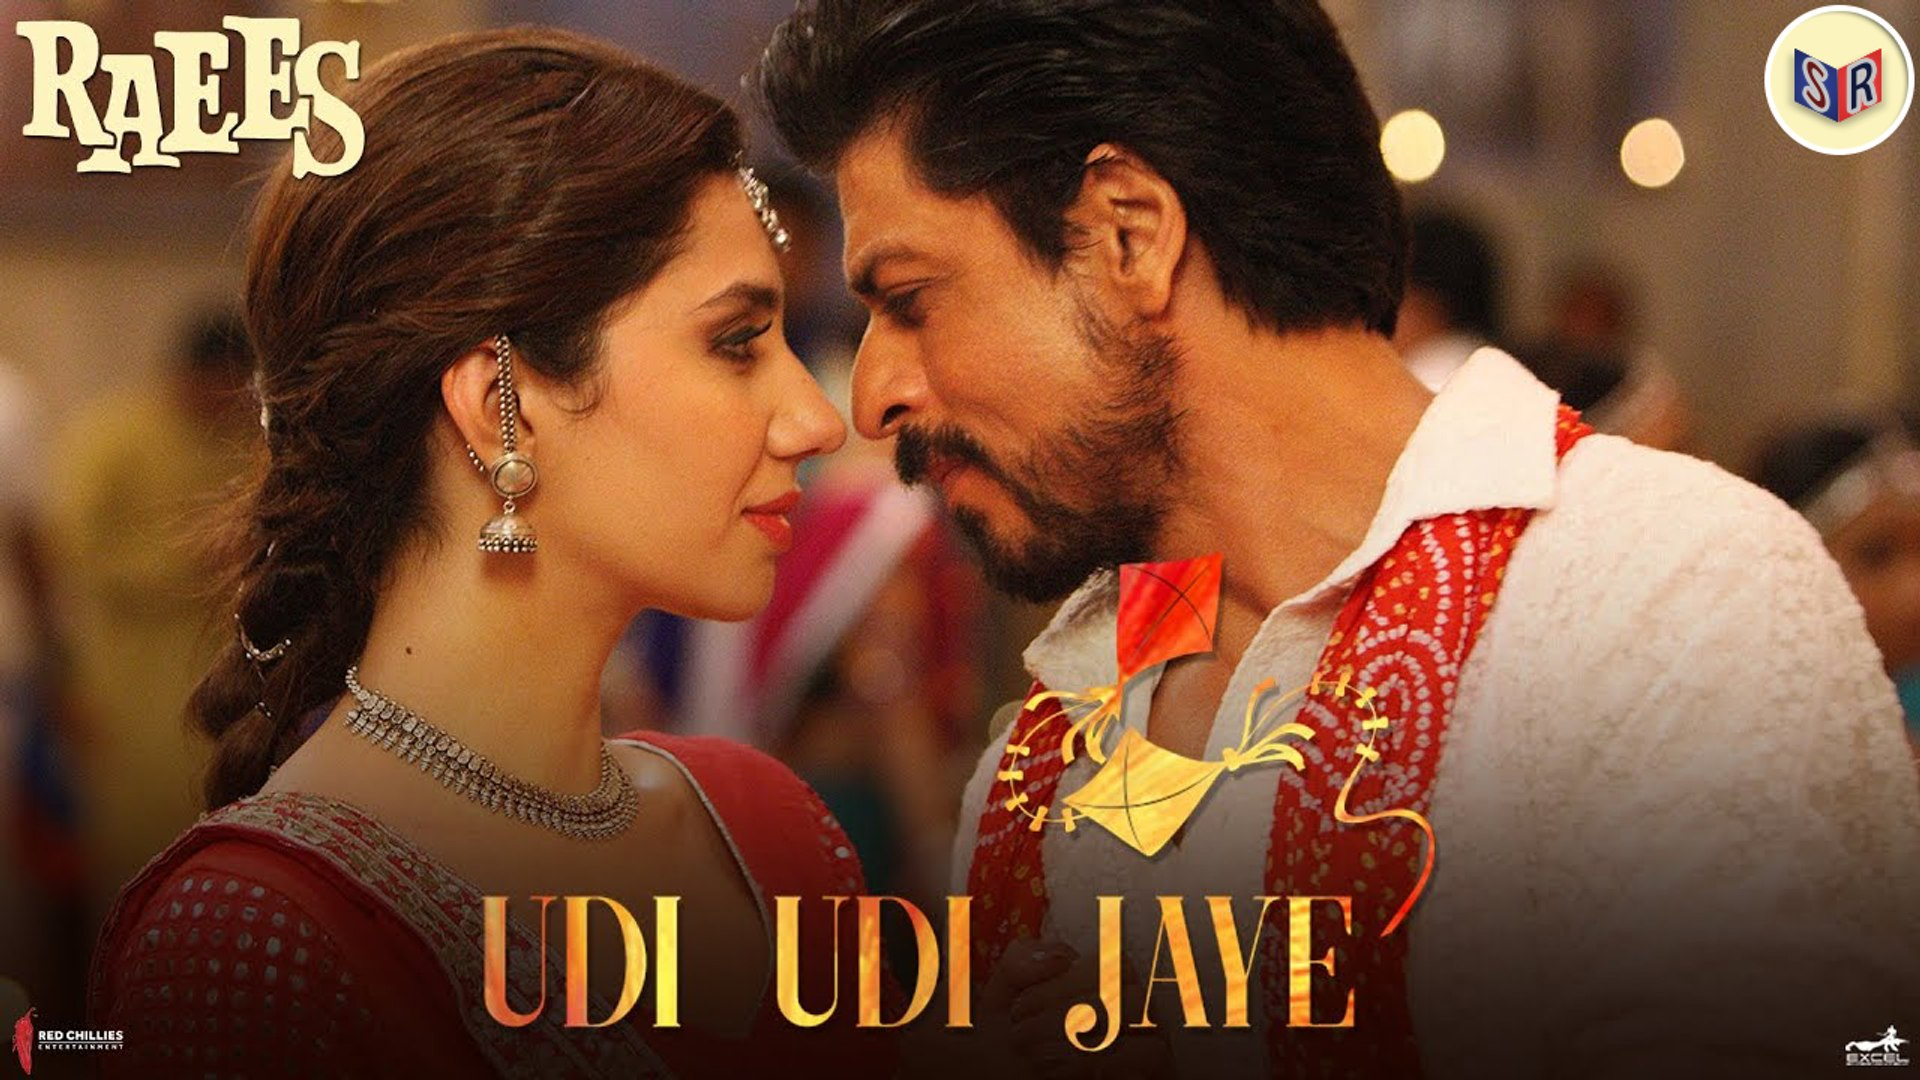 Udi Udi Jaye Raees 2016 Ft Shah Rukh Khan Mahira Khan Full Hd Video Dailymotion